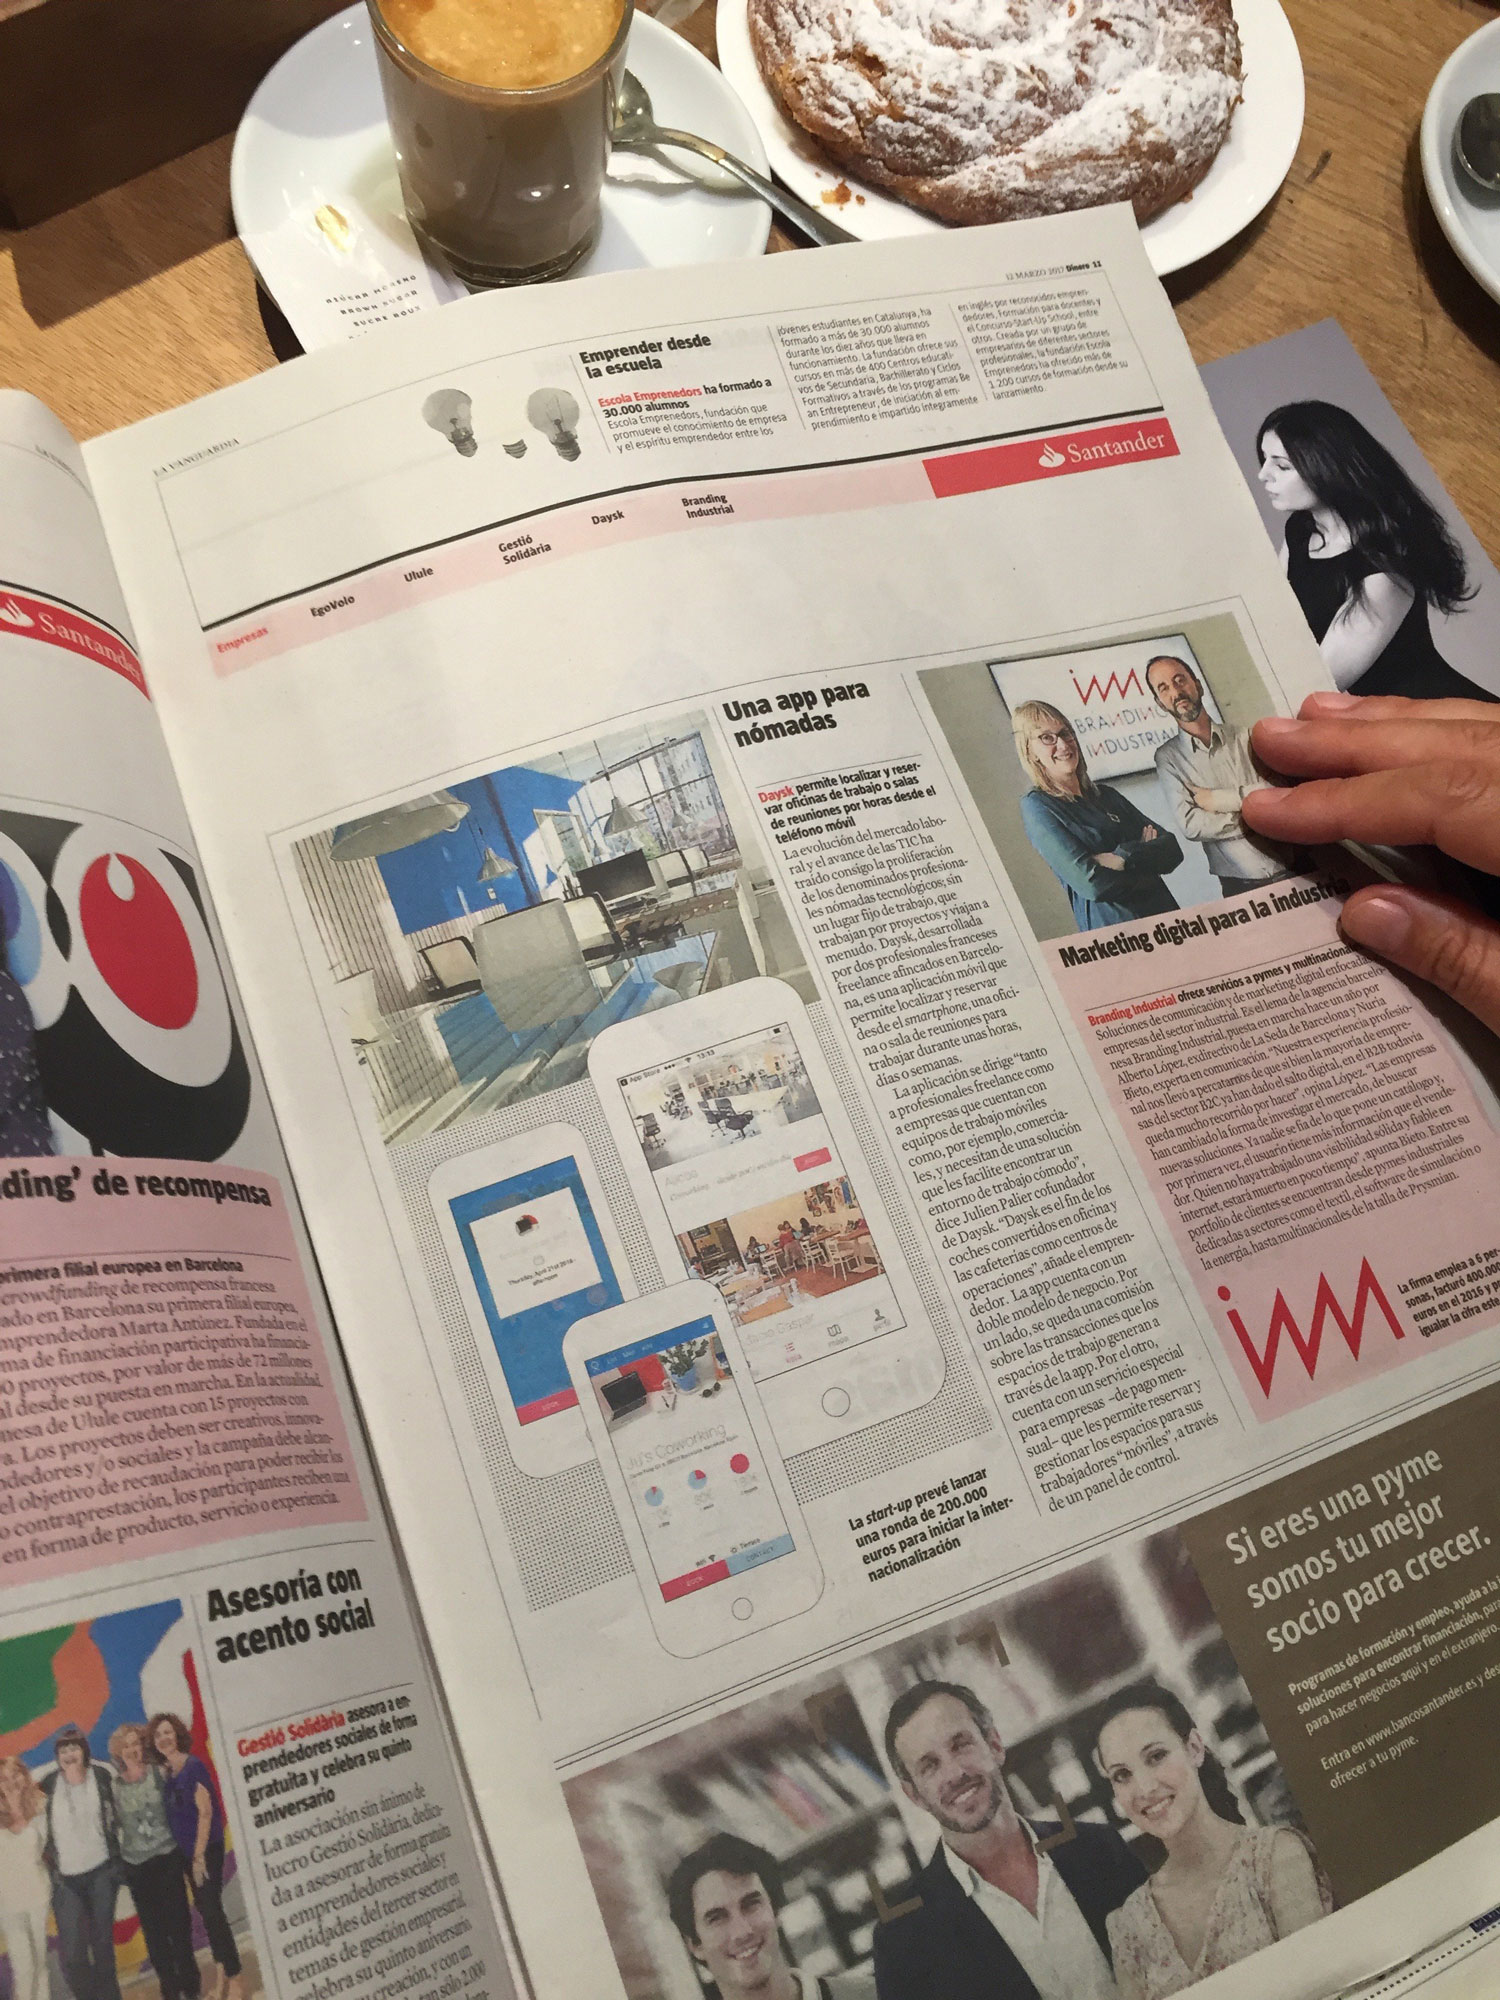 Daysk featured in La Vanguardia